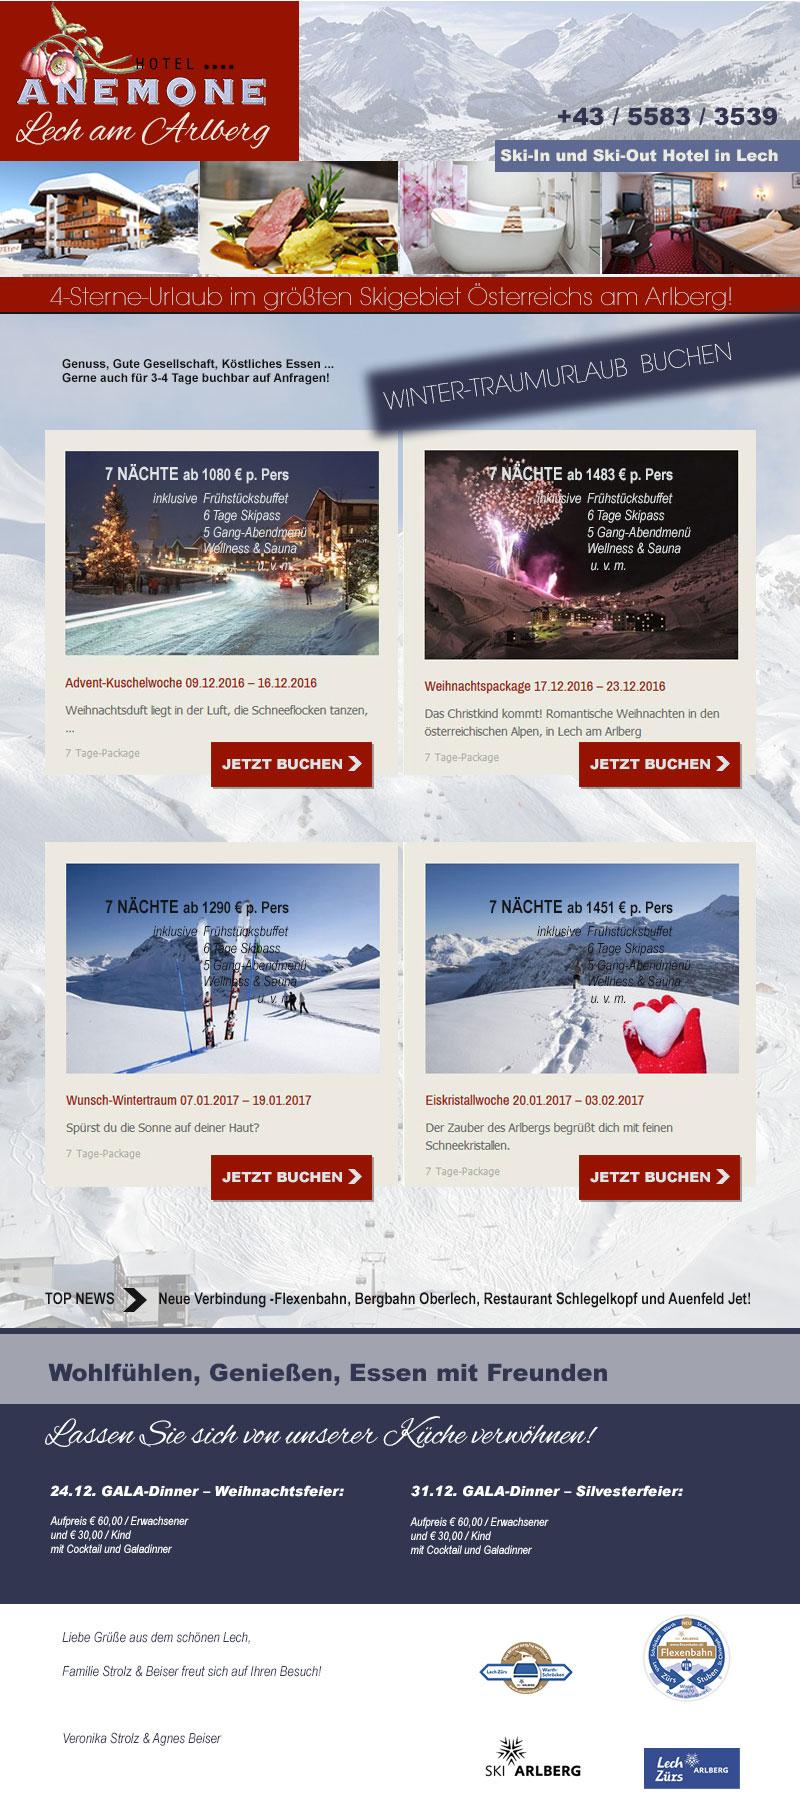 Newsletter Design, Hotel Anemone****, Lech am Arlberg, AT